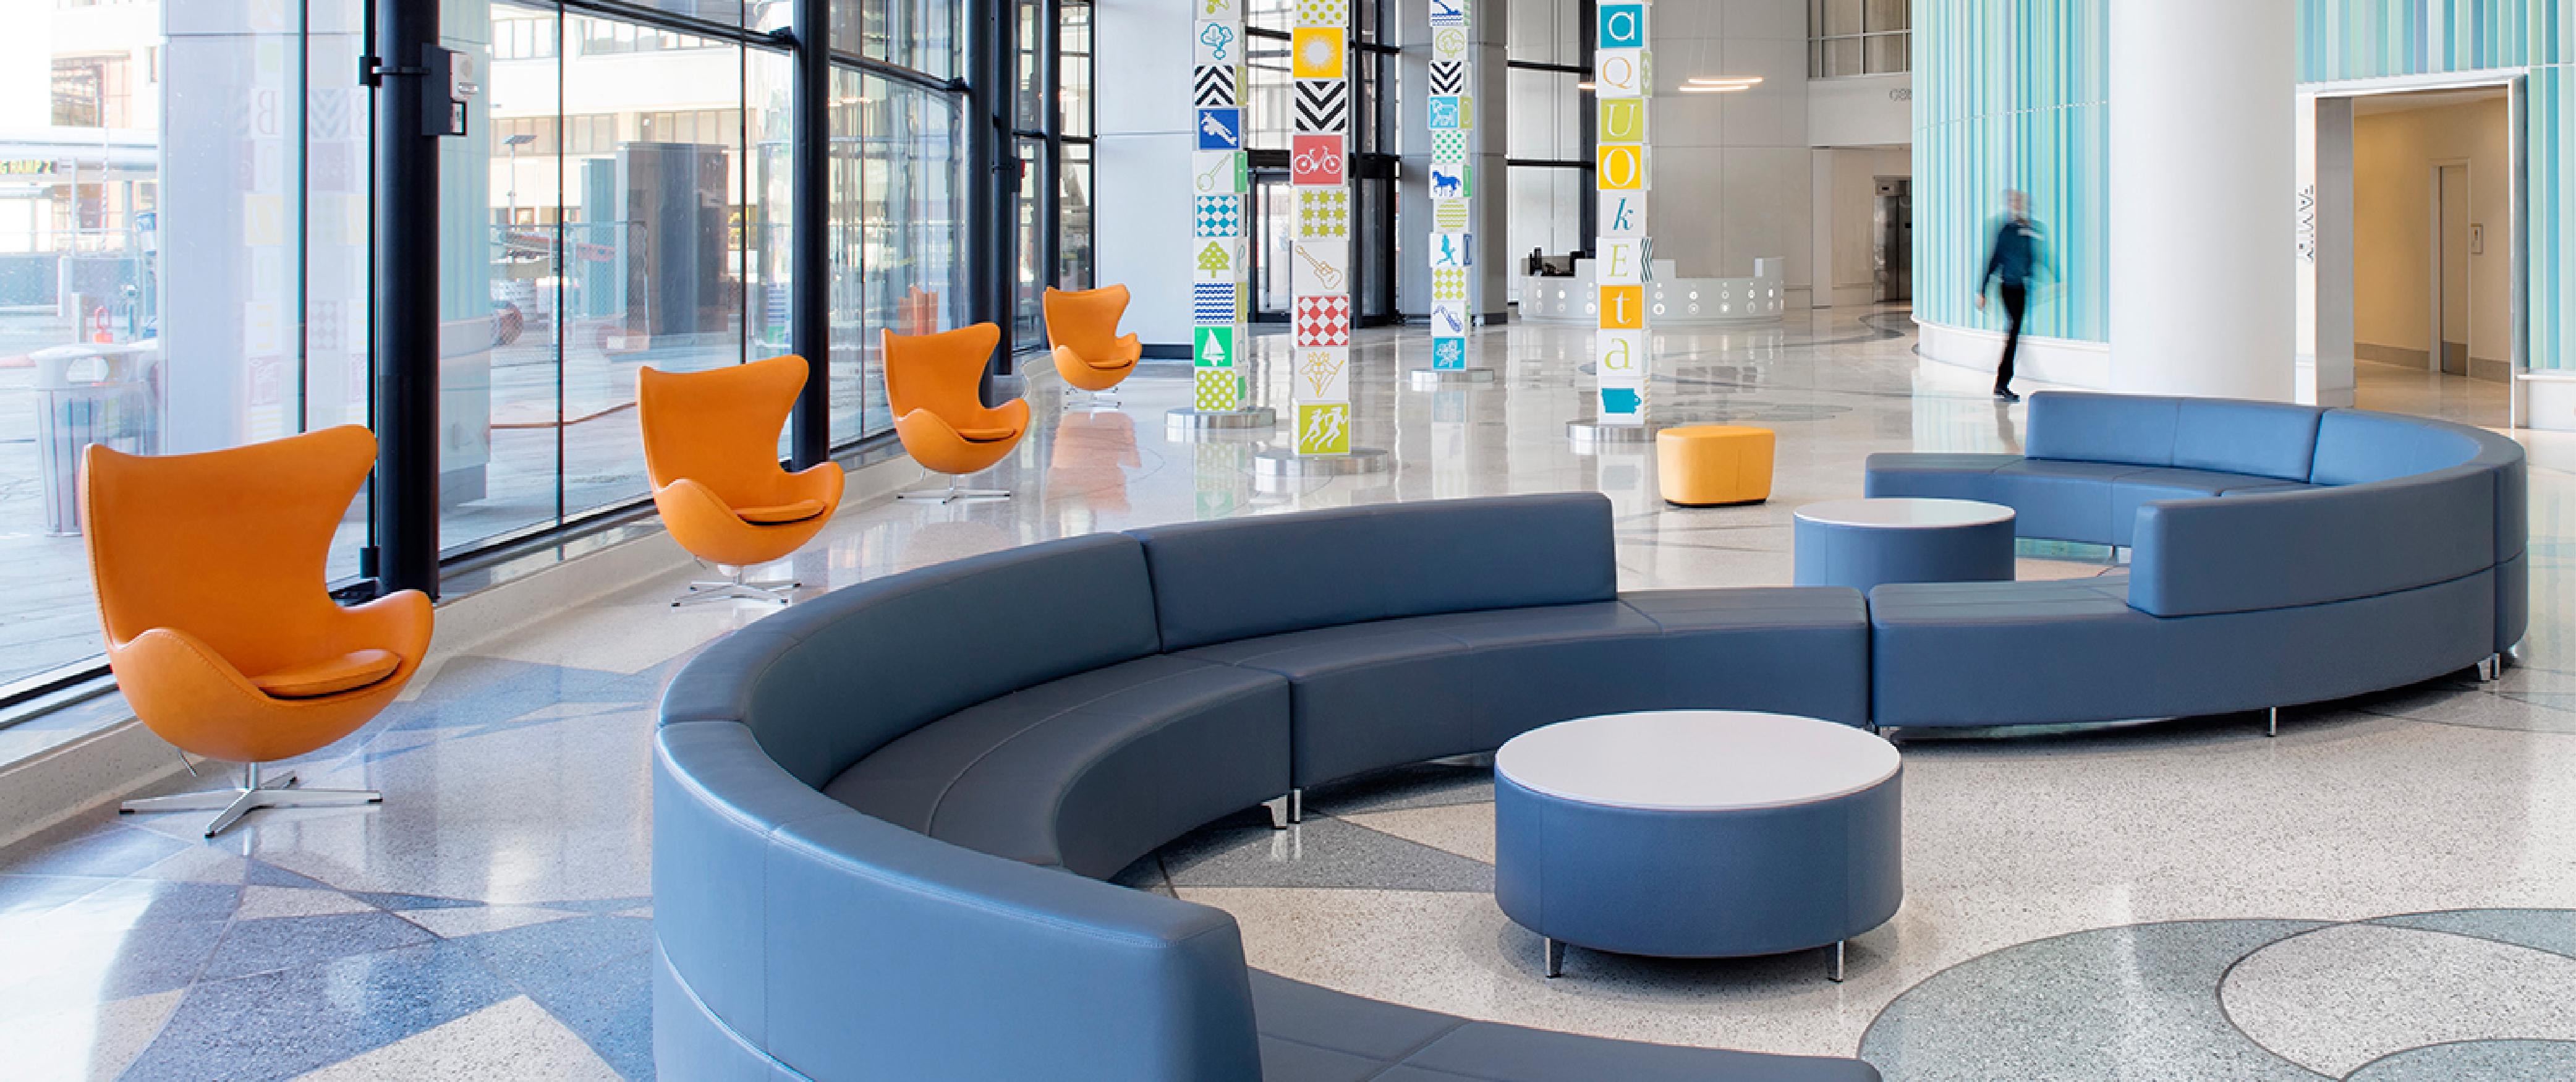 University of iowa stead family children 39 s hospital pigott - Iowa state university interior design ...